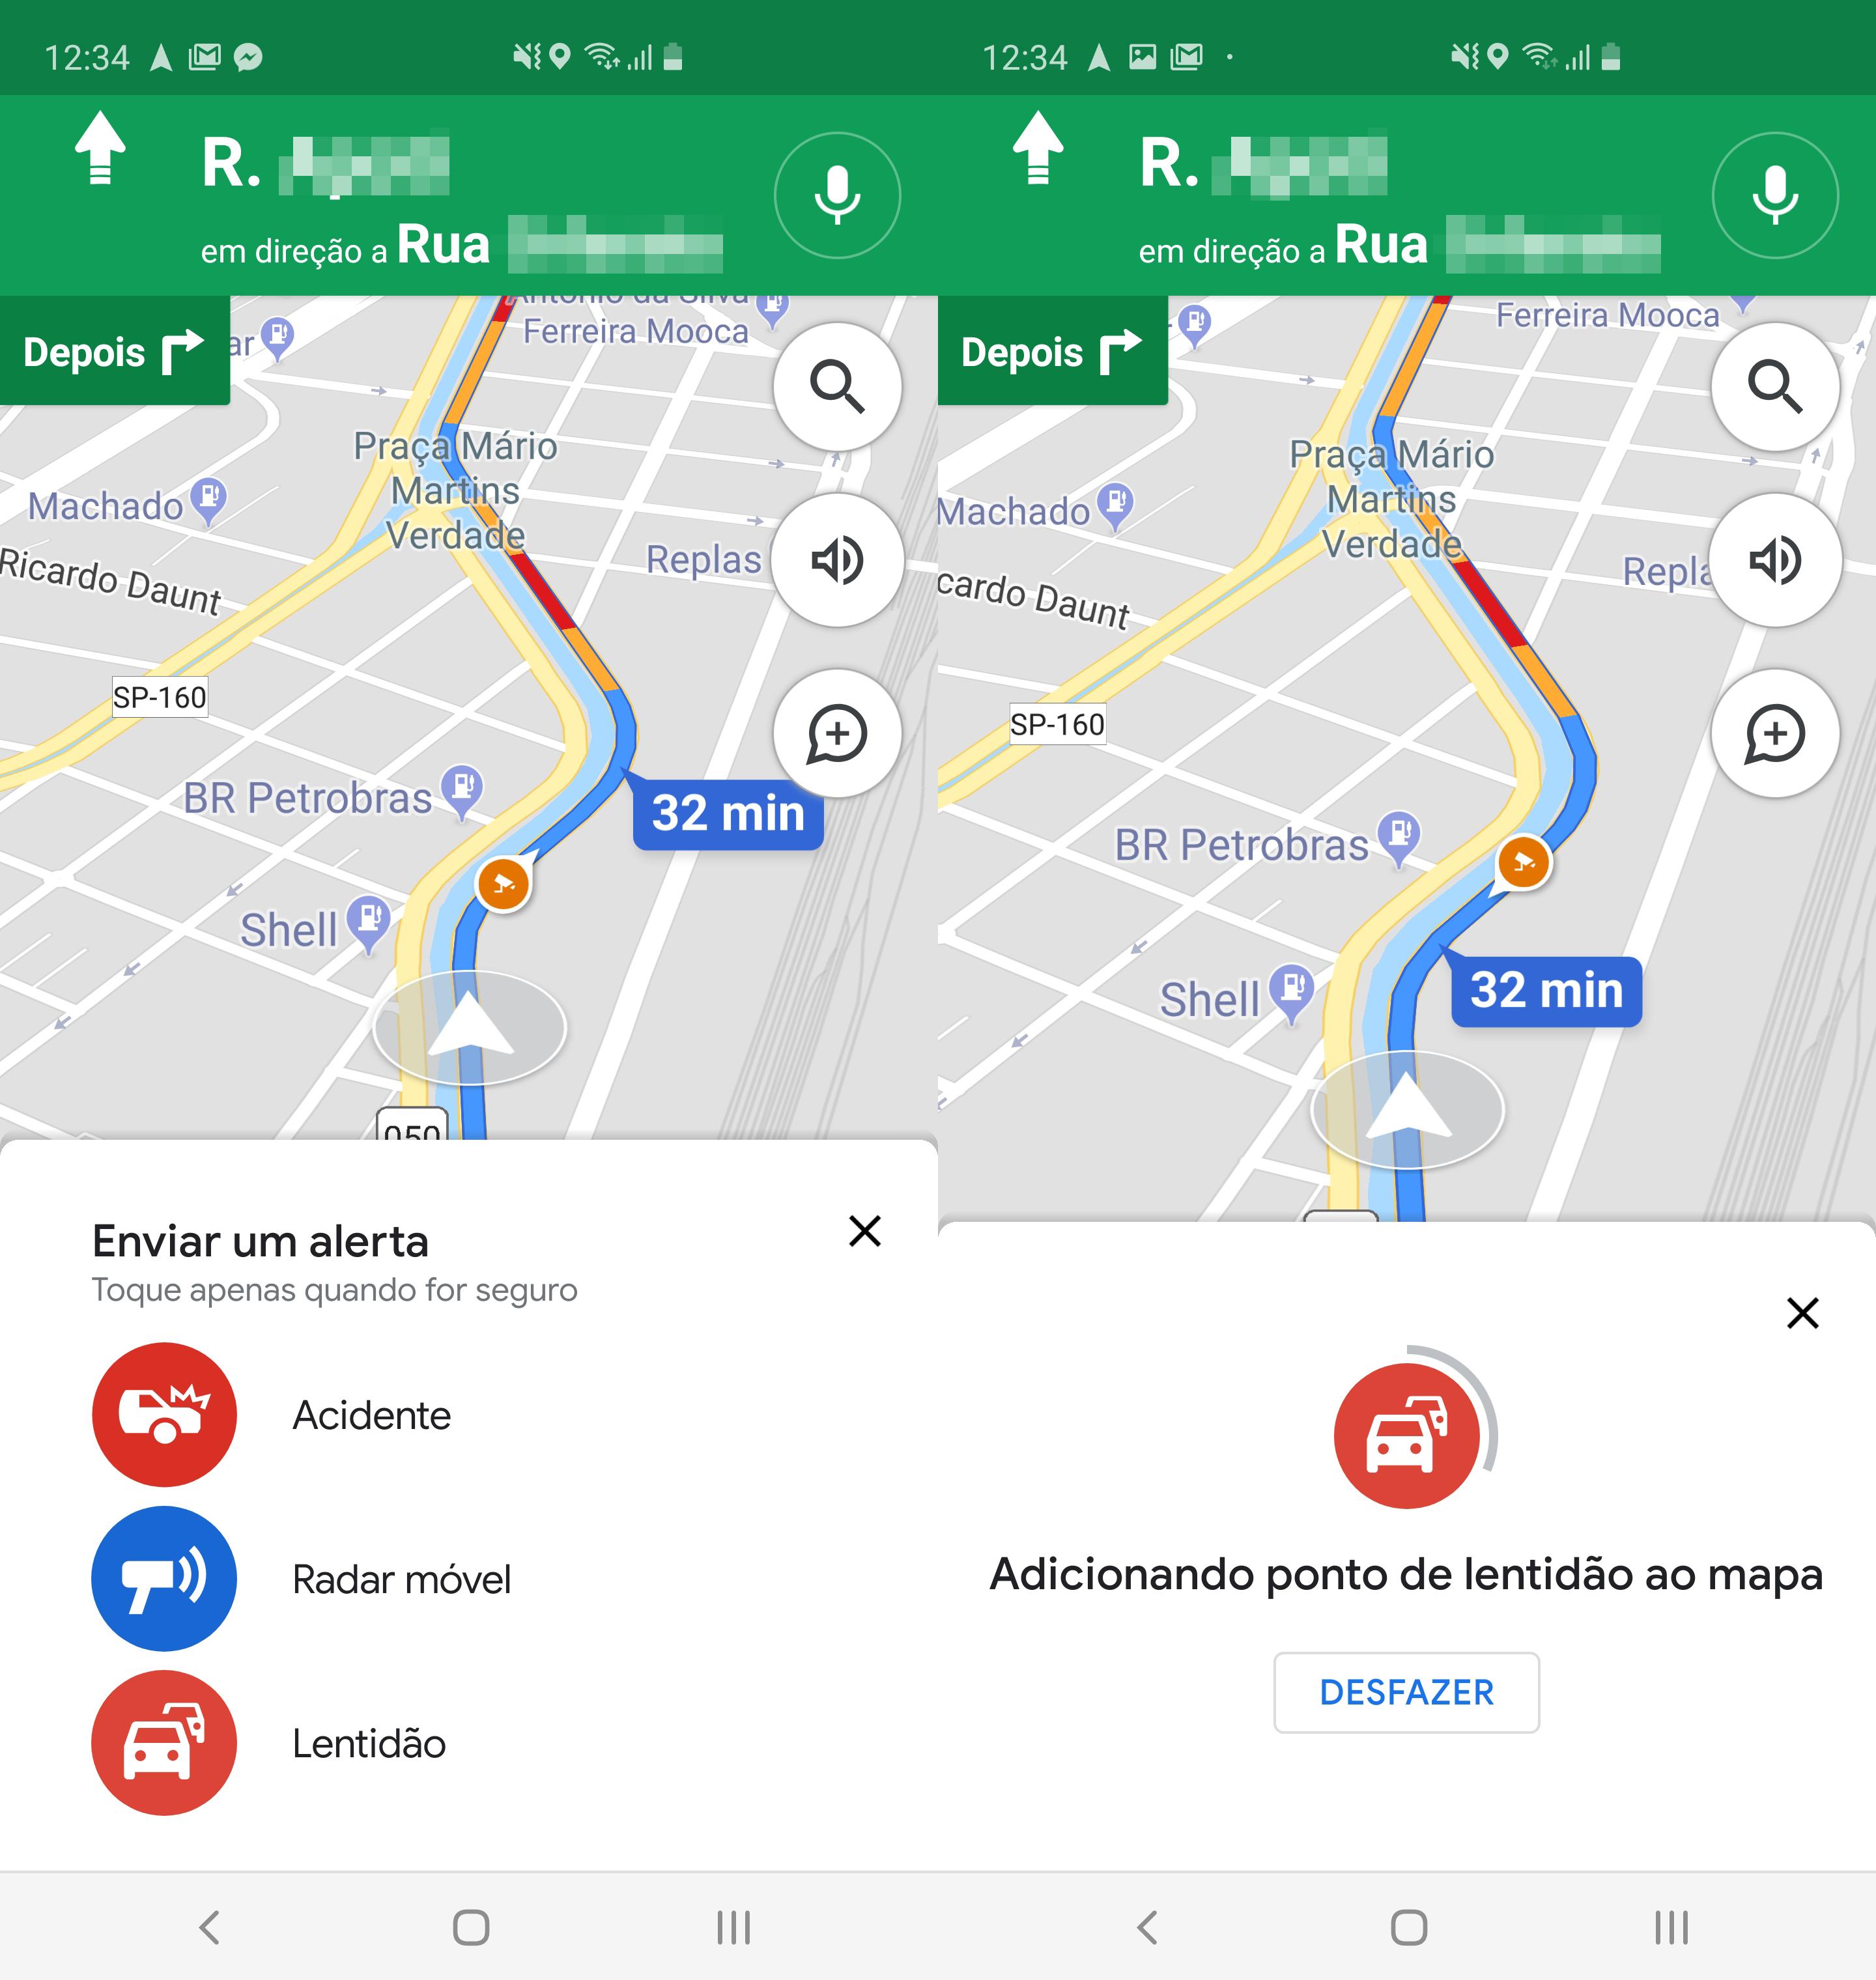 Option to warn slow traffic on Google Maps